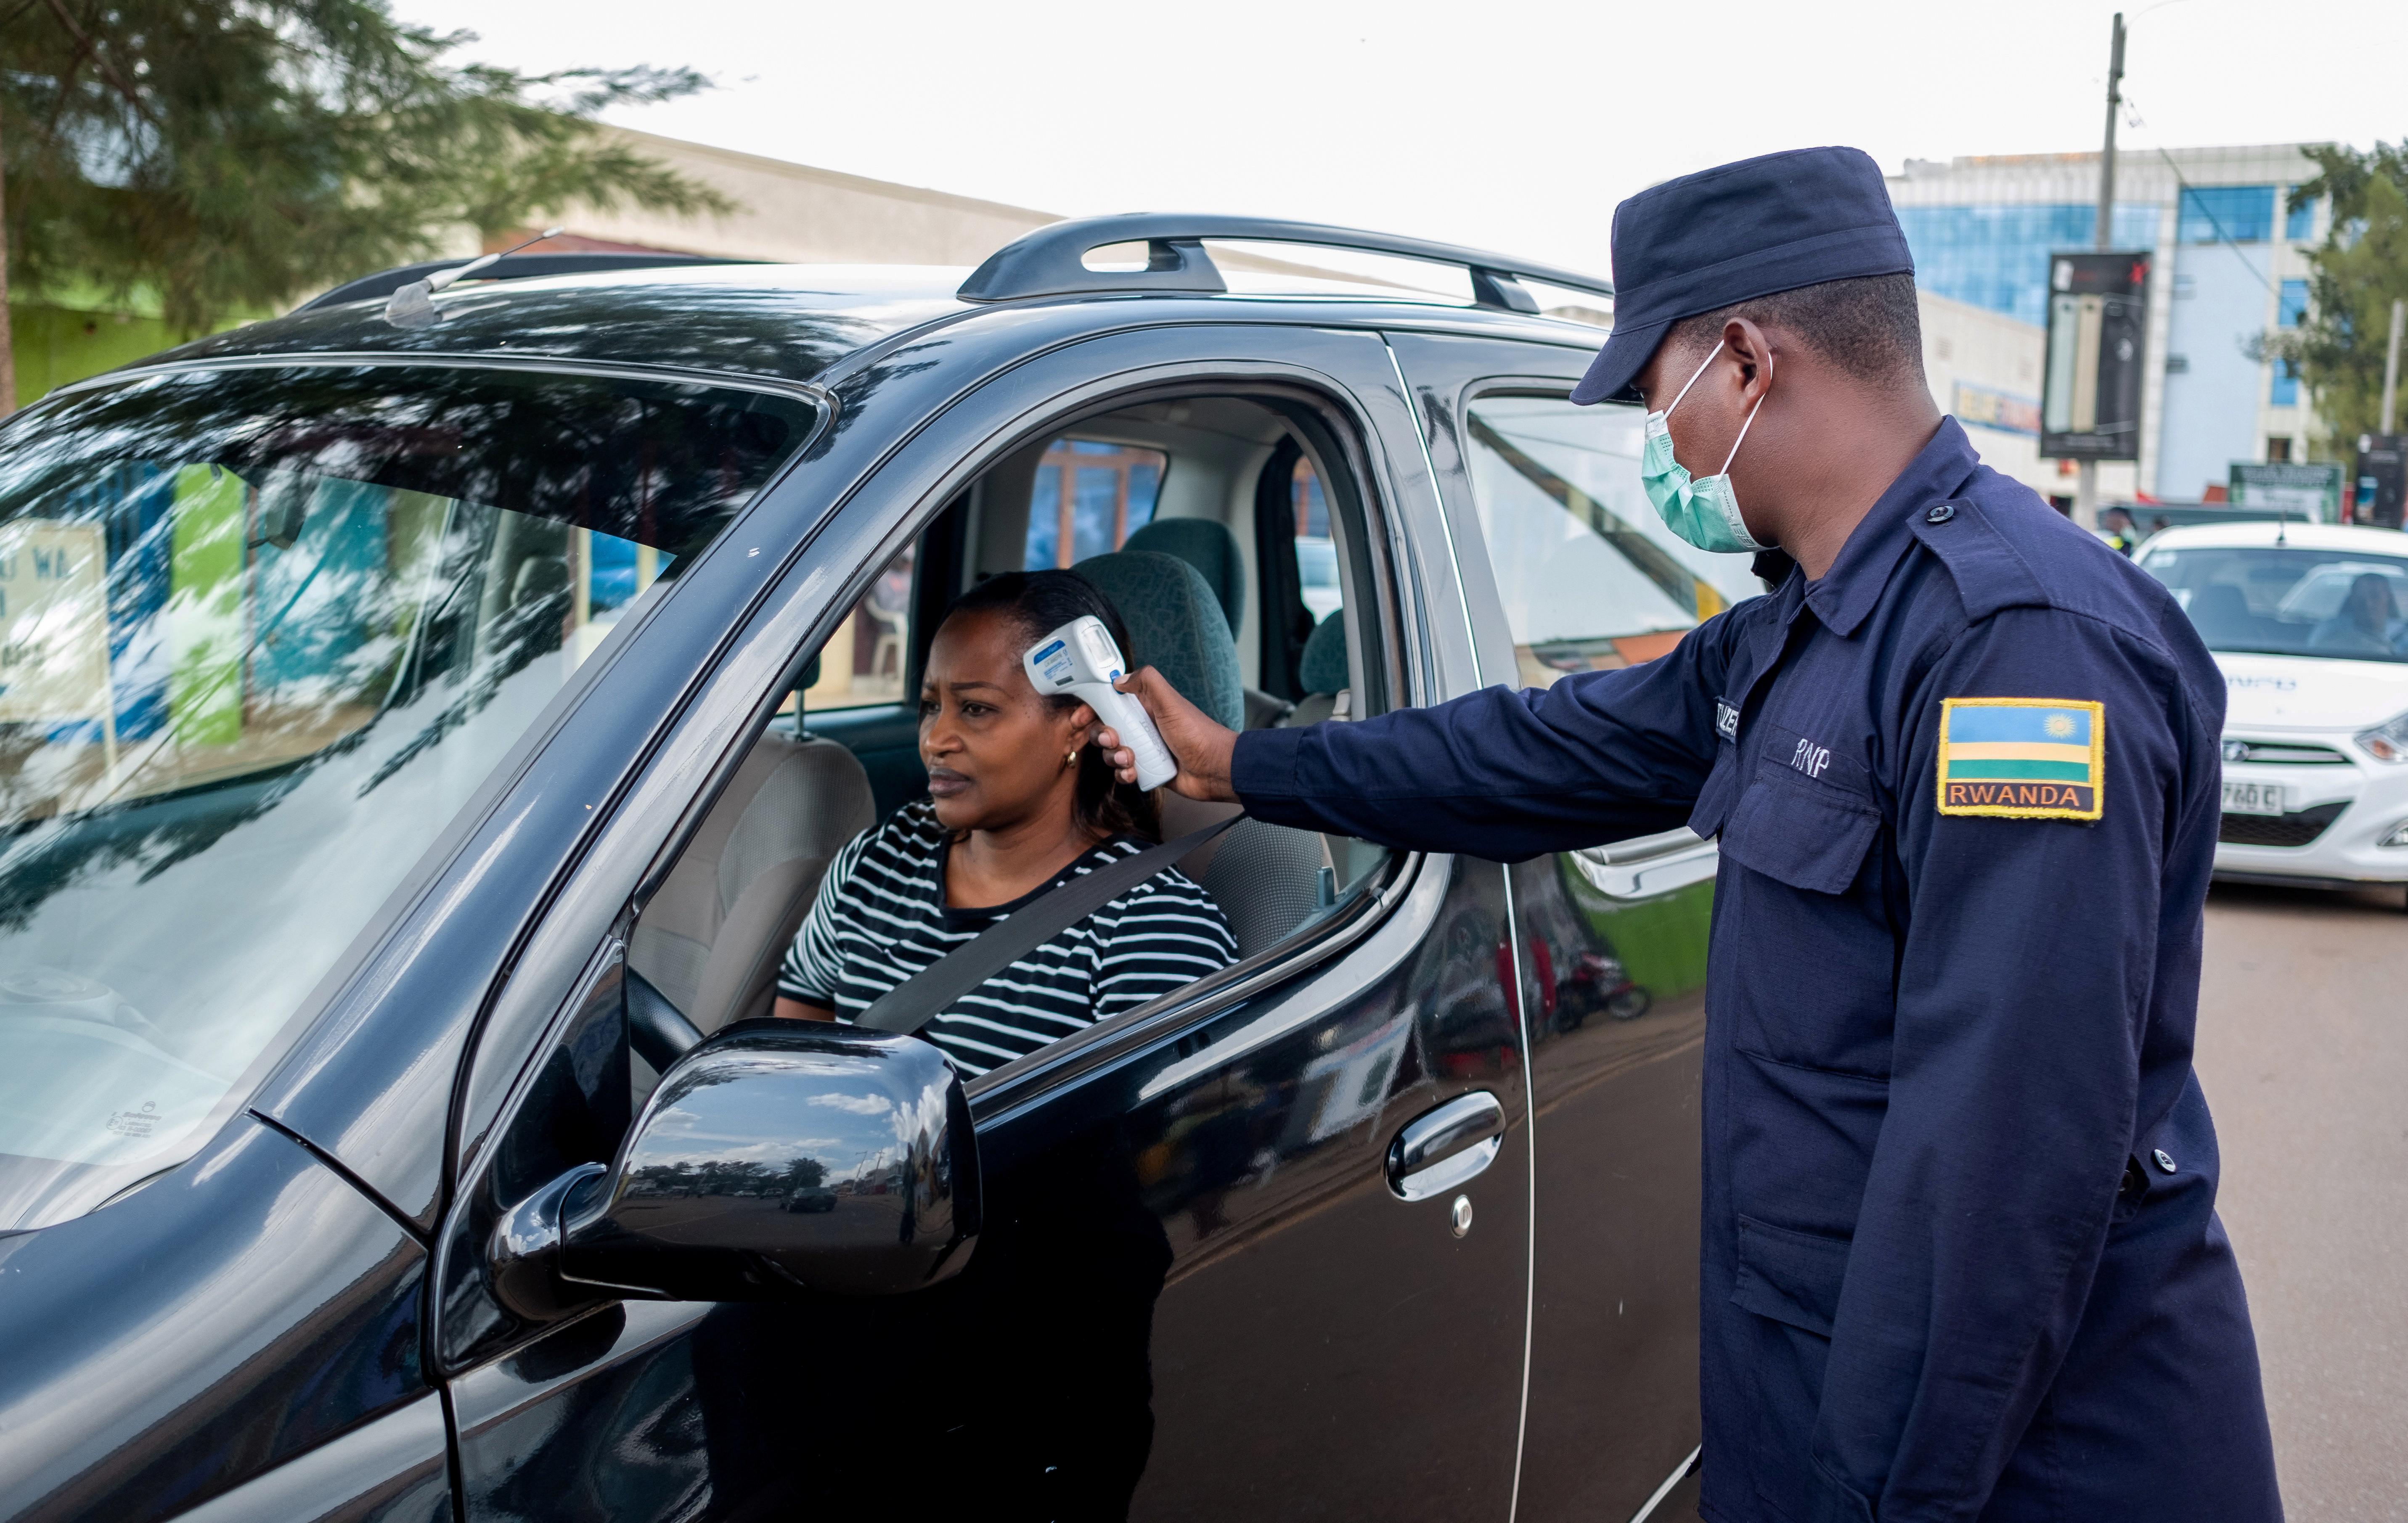 A Rwandan police checks the temperature of a motorist as he enforces a lockdown to stem the coronavirus disease (COVID-19) outbreak in Kigali, Rwanda April 15, 2020. Picture taken April 15, 2020. REUTERS/Jean Bizimana - RC286G9BGM1U